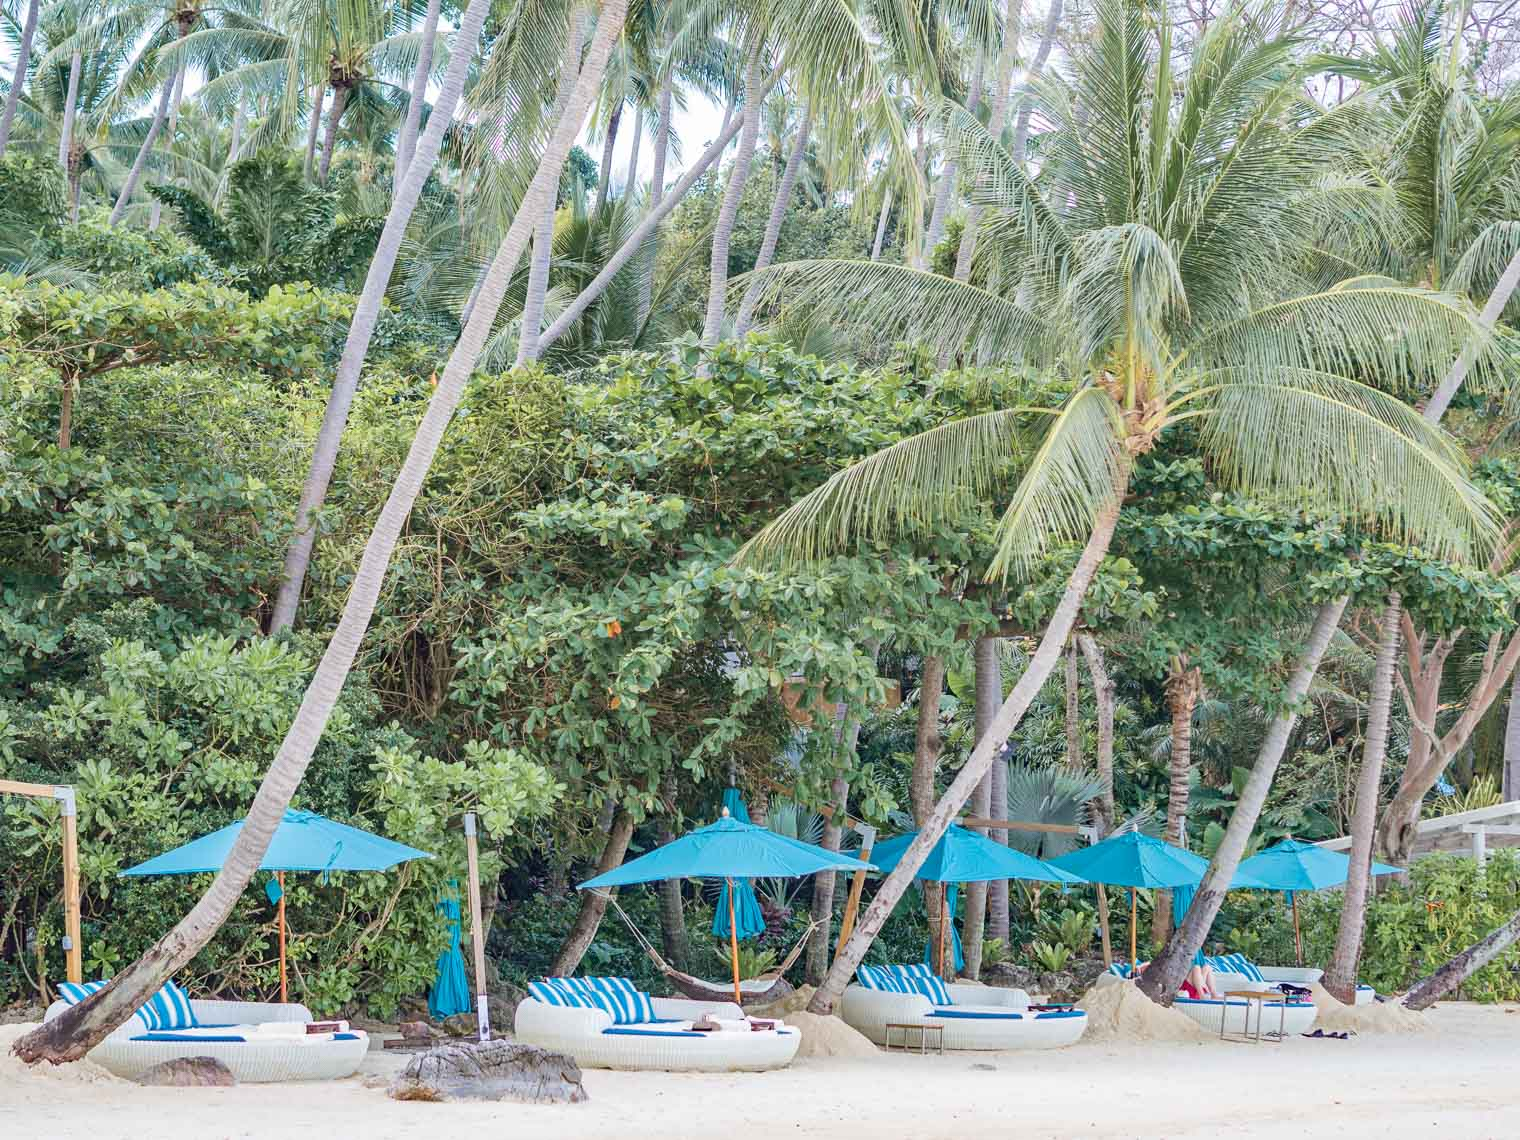 Private beach at Four Seasons hotel Koh Samui